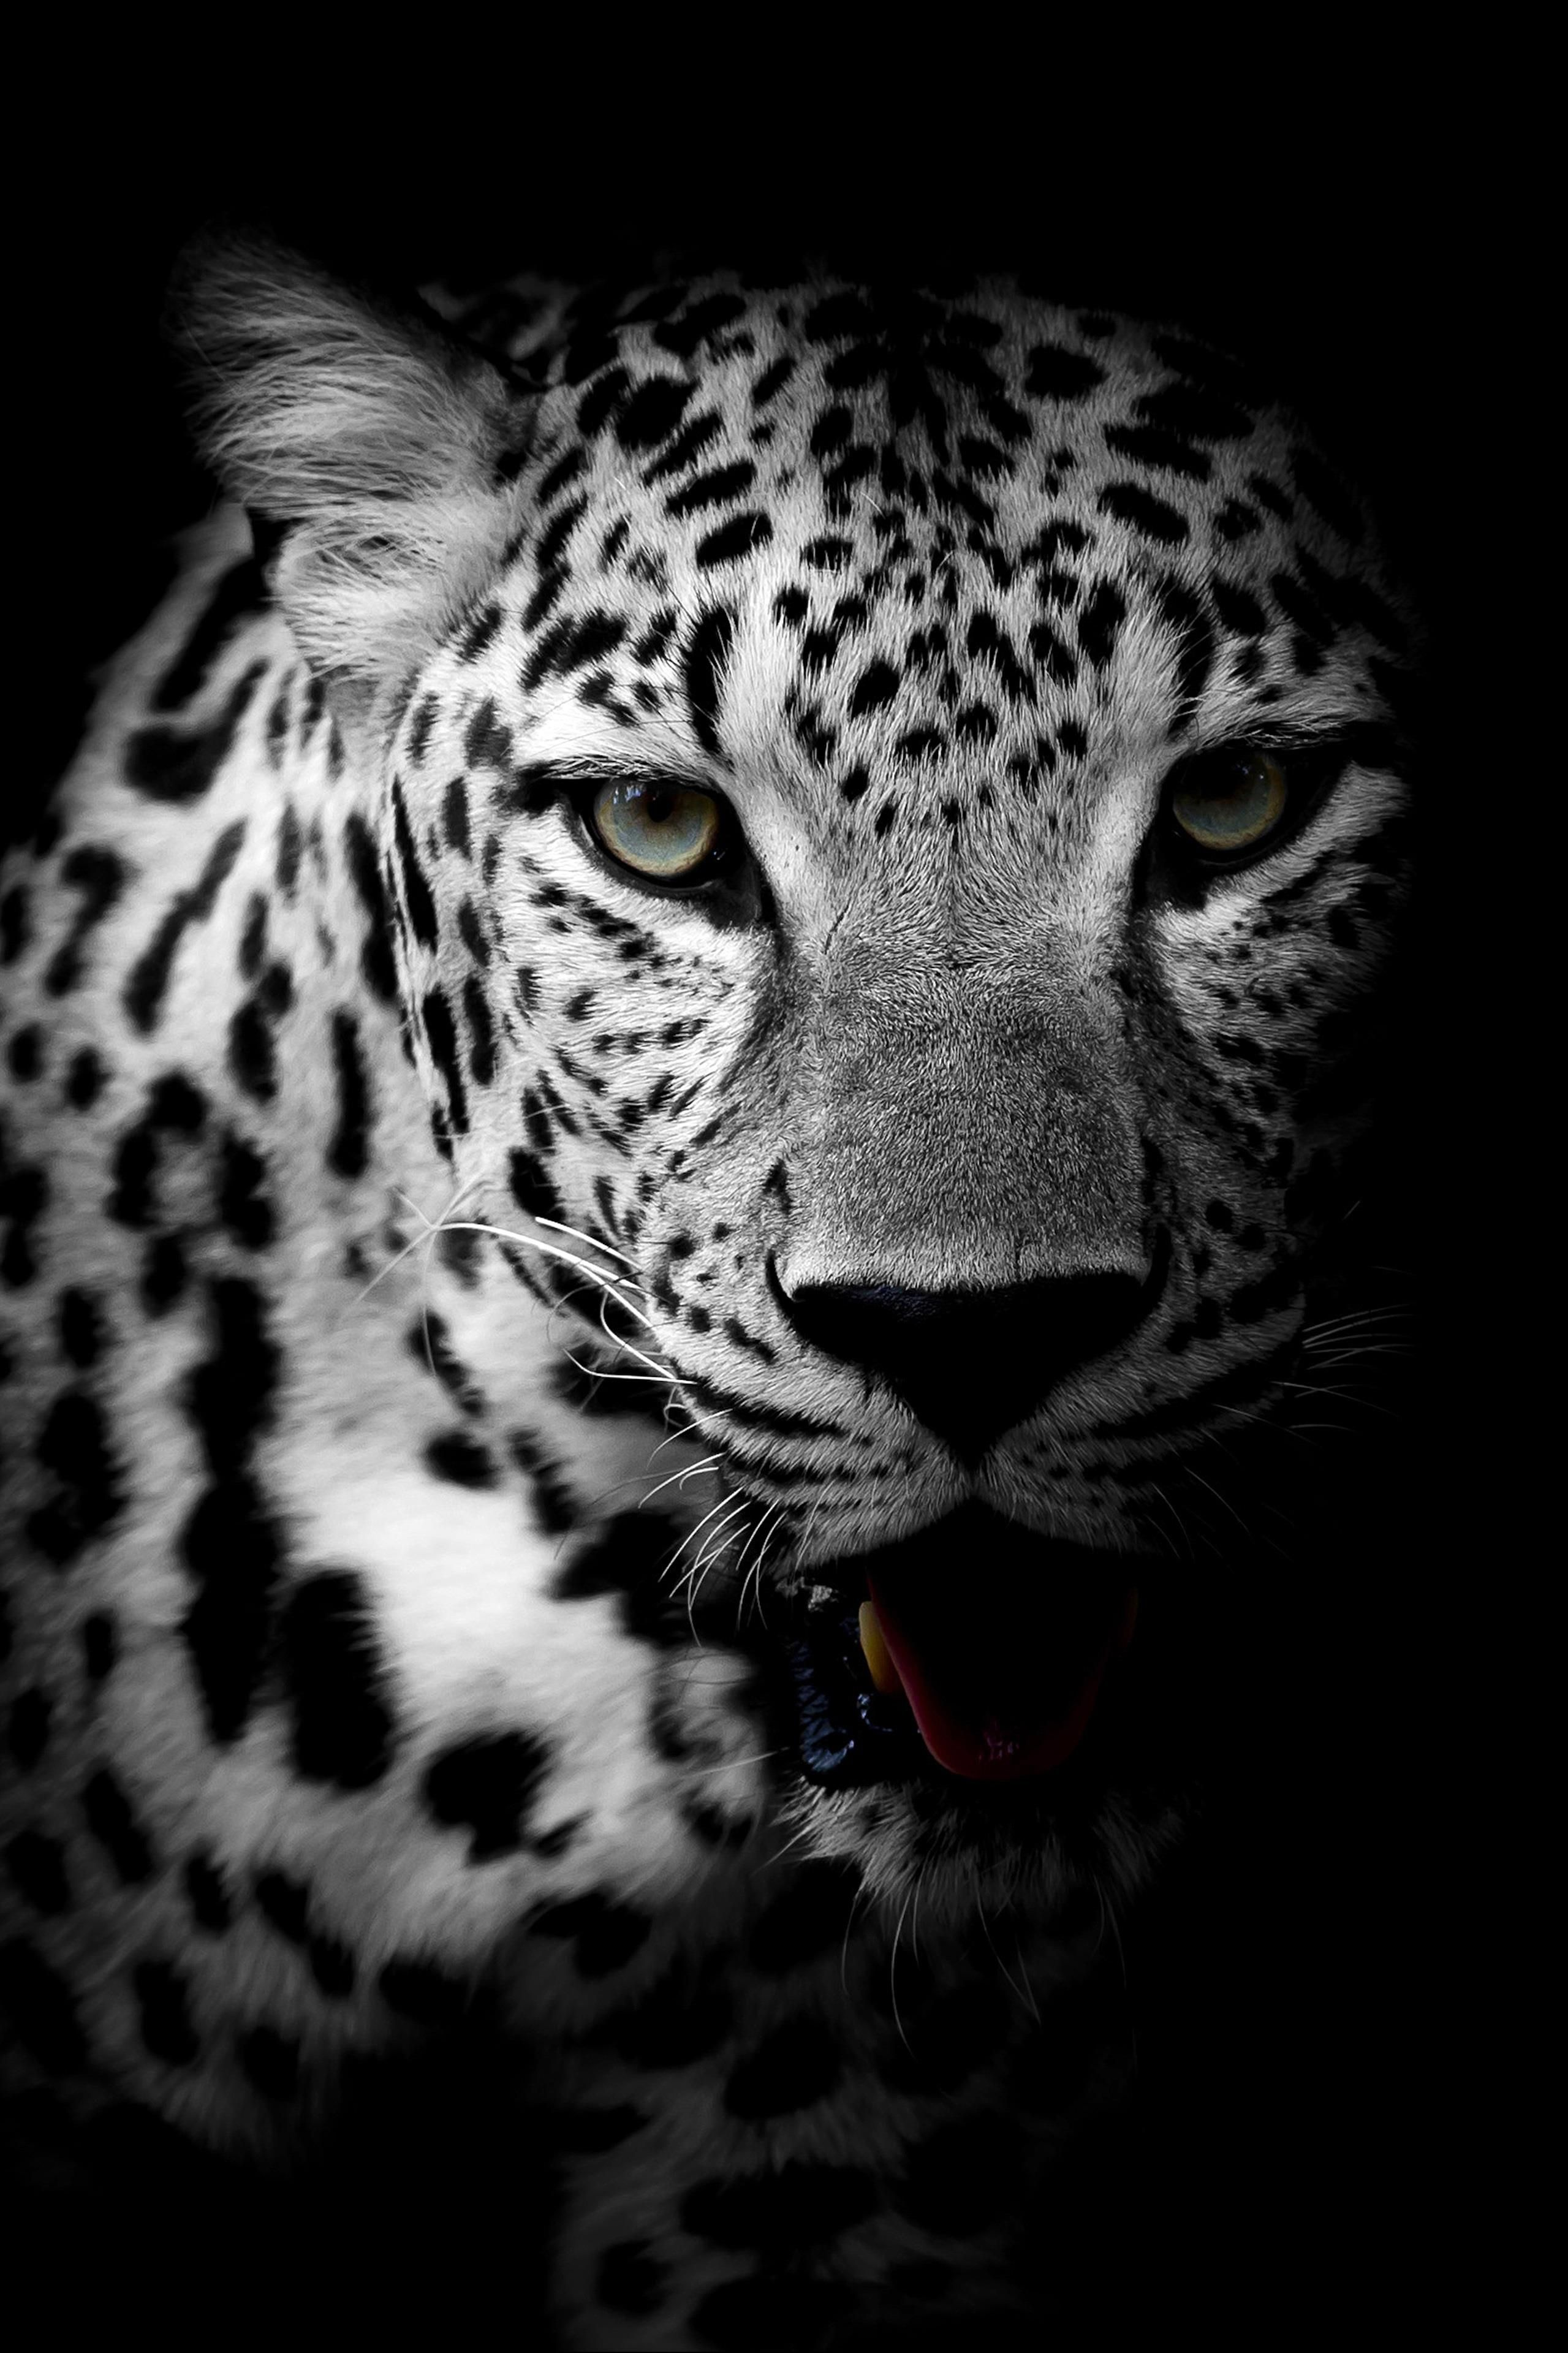 Amoled Animal Wallpaper Leopard Wallpaper Animals Black And White Wild Animal Wallpaper